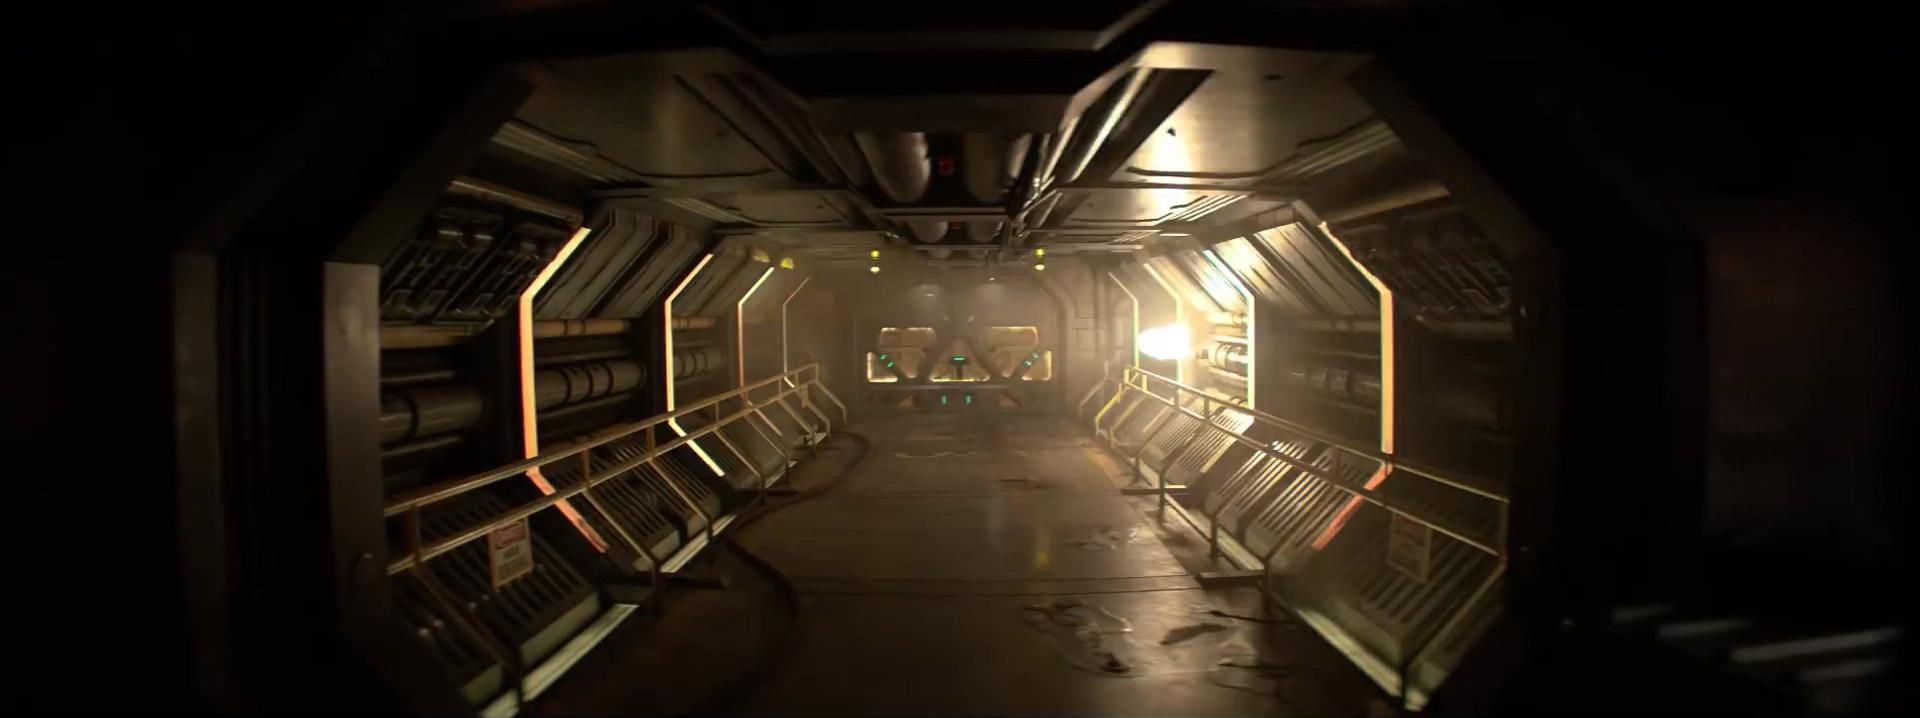 doom-2016-video-game-trailer-3